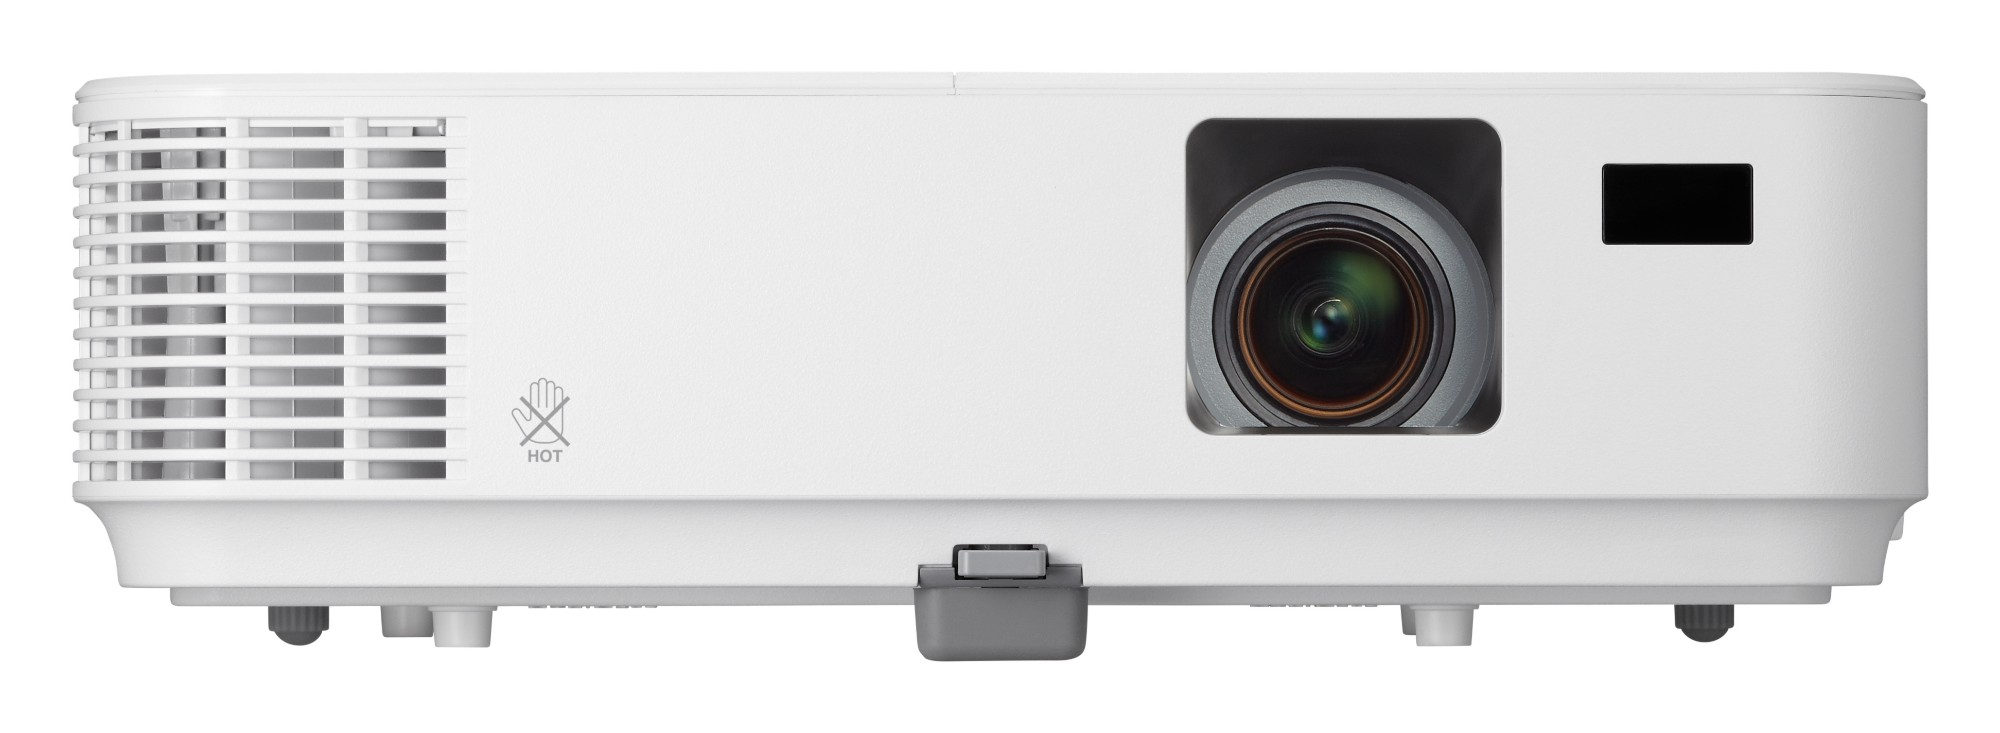 NEC V302X Desktop projector 3000ANSI lumens DLP XGA (1024x768) 3D White data projector